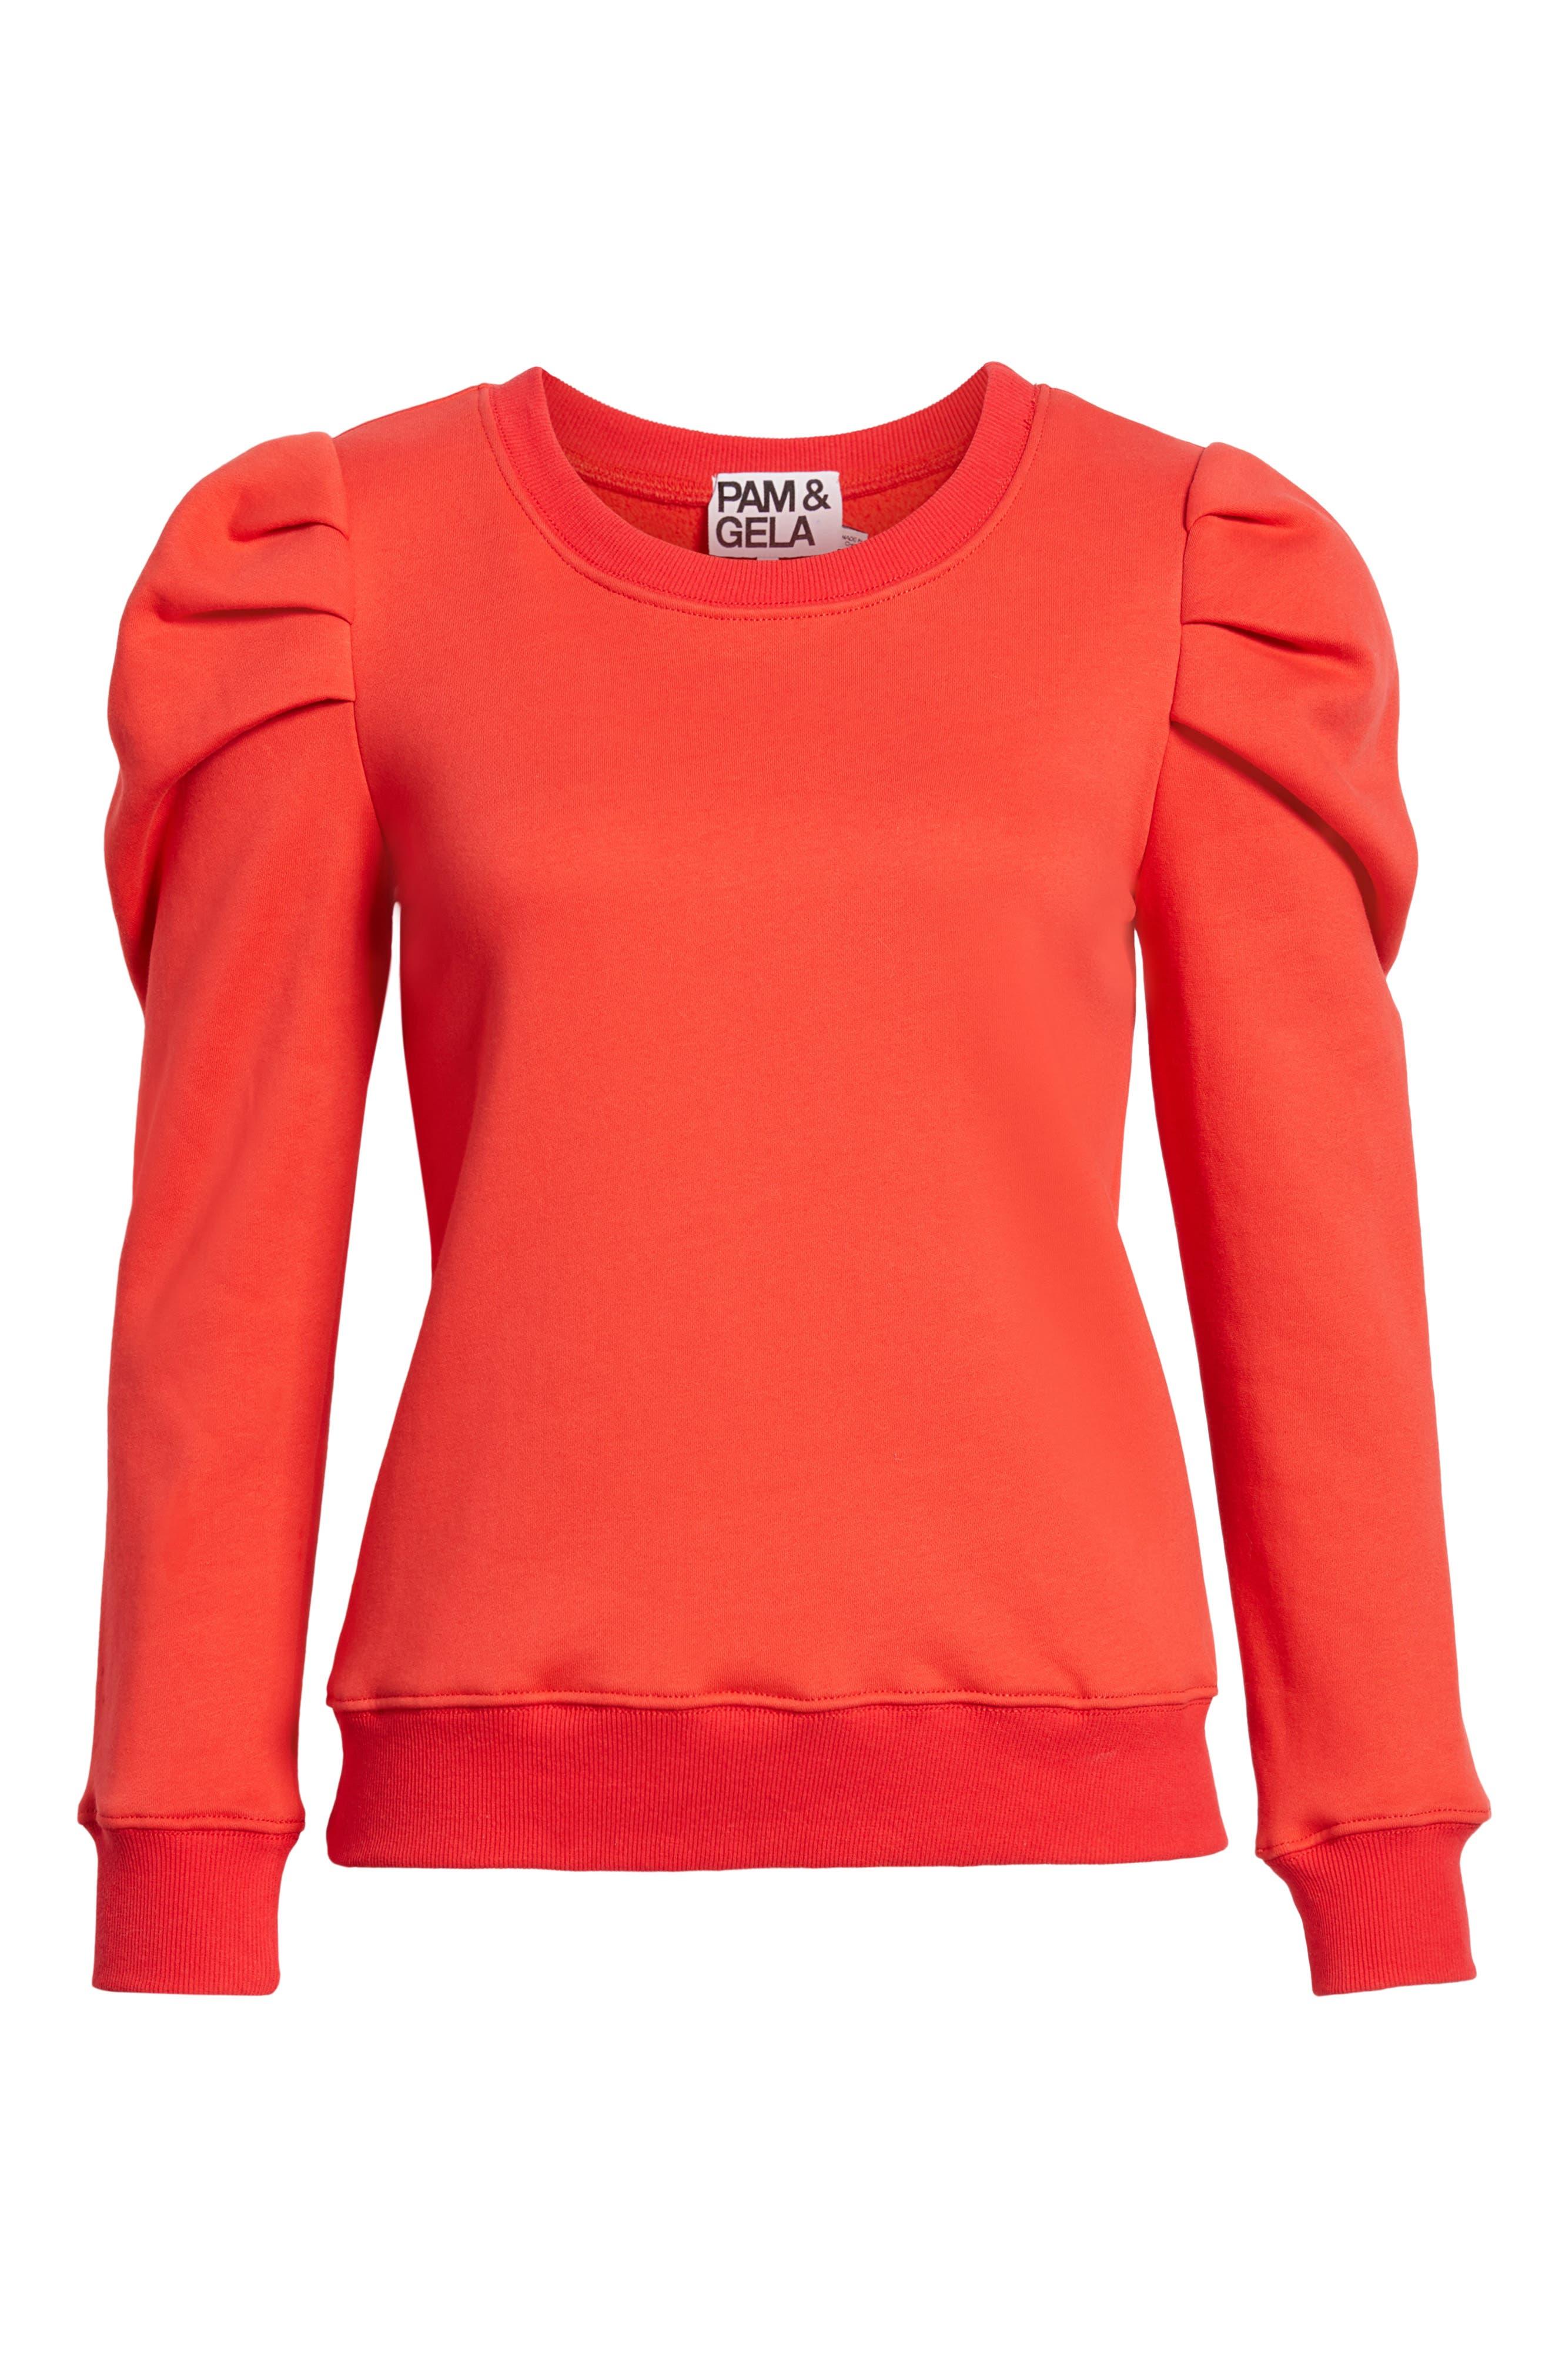 PAM & GELA,                             Puff Sleeve Sweatshirt,                             Alternate thumbnail 6, color,                             600